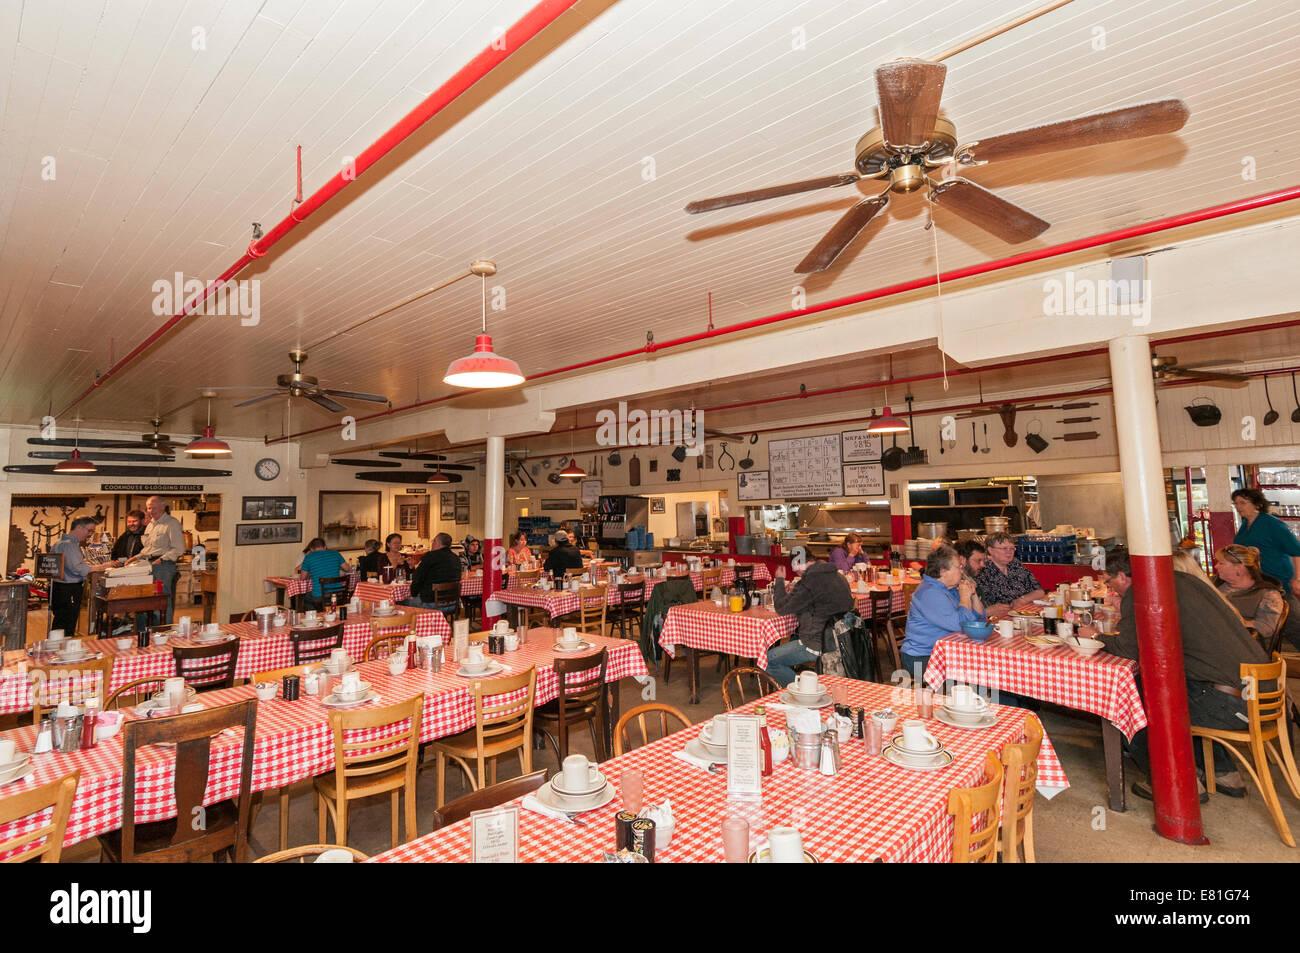 California, Samoa Cookhouse historic restaurant built 1890 - Stock Image